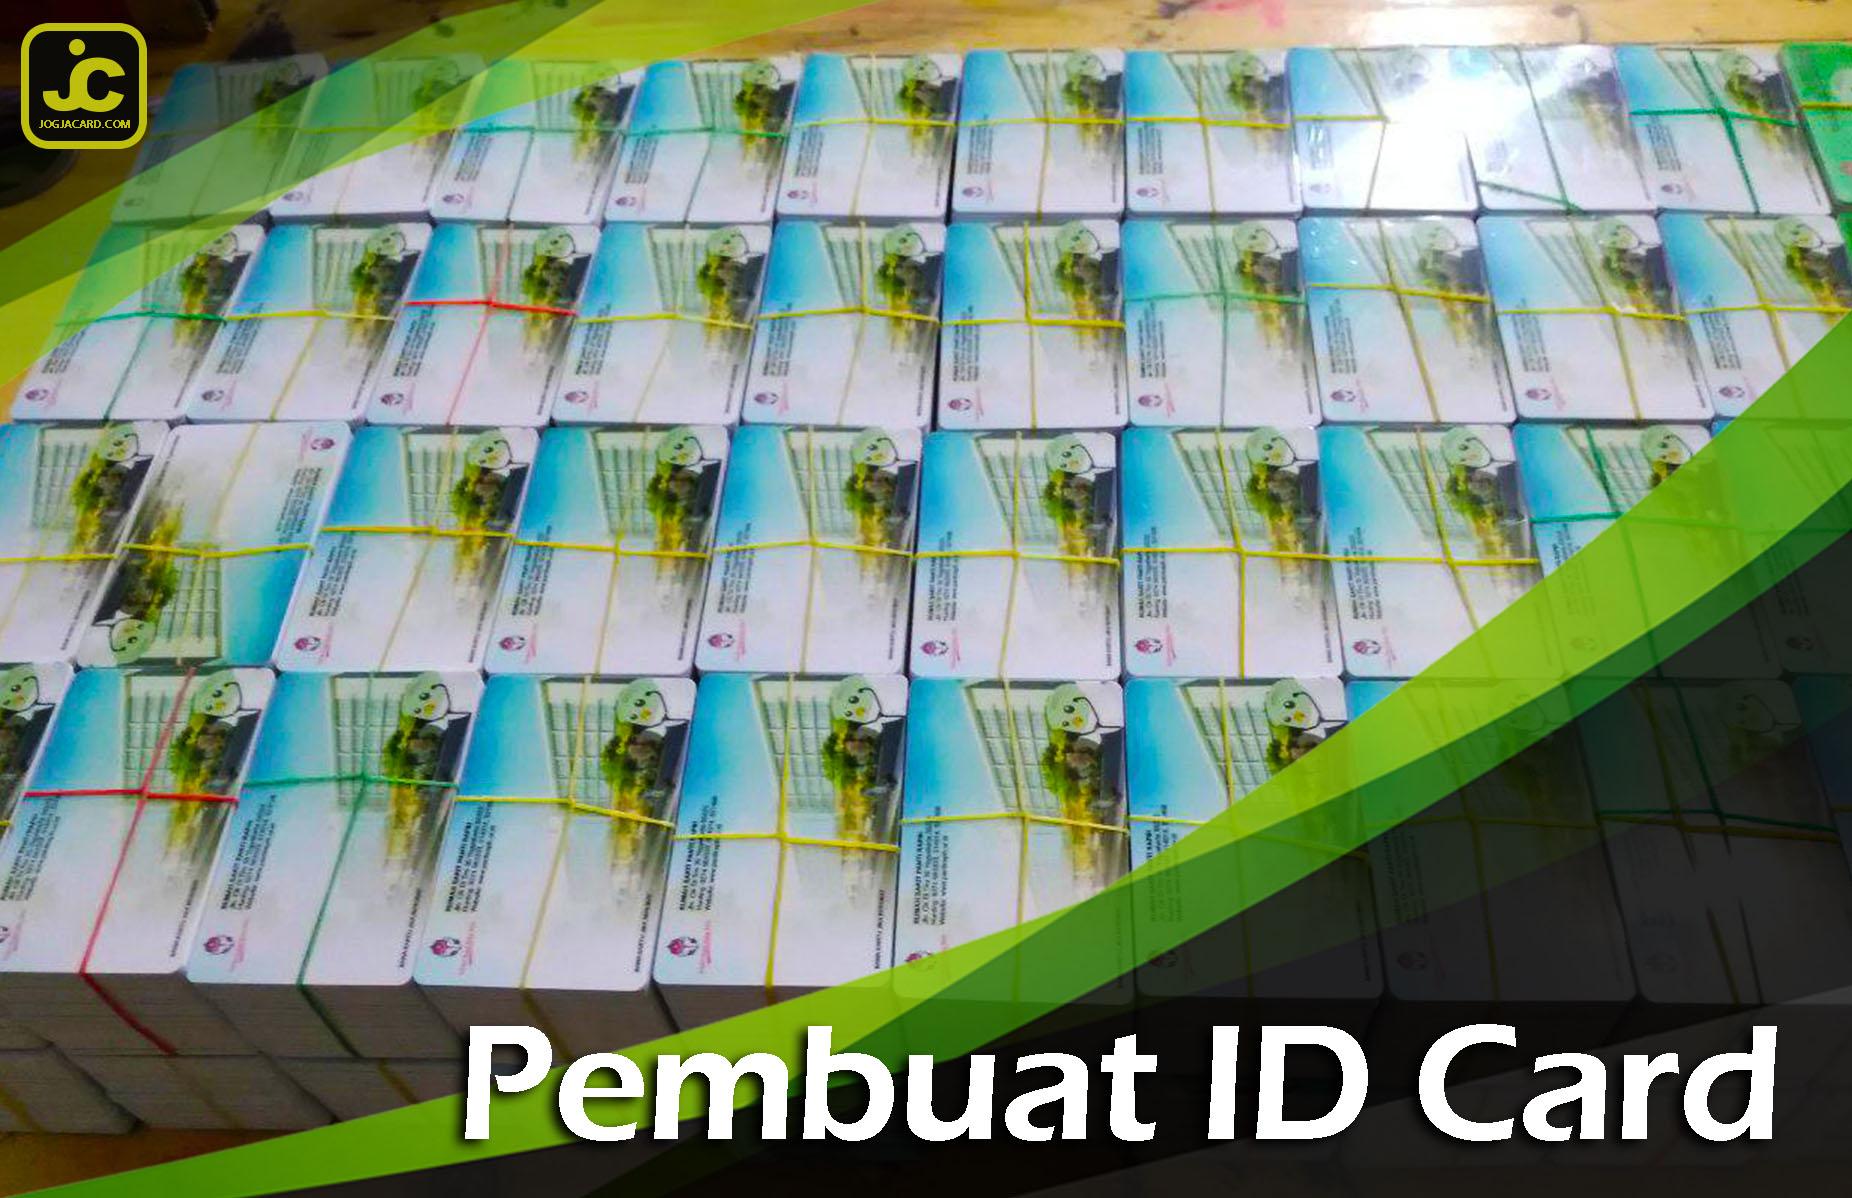 Pembuat ID Card